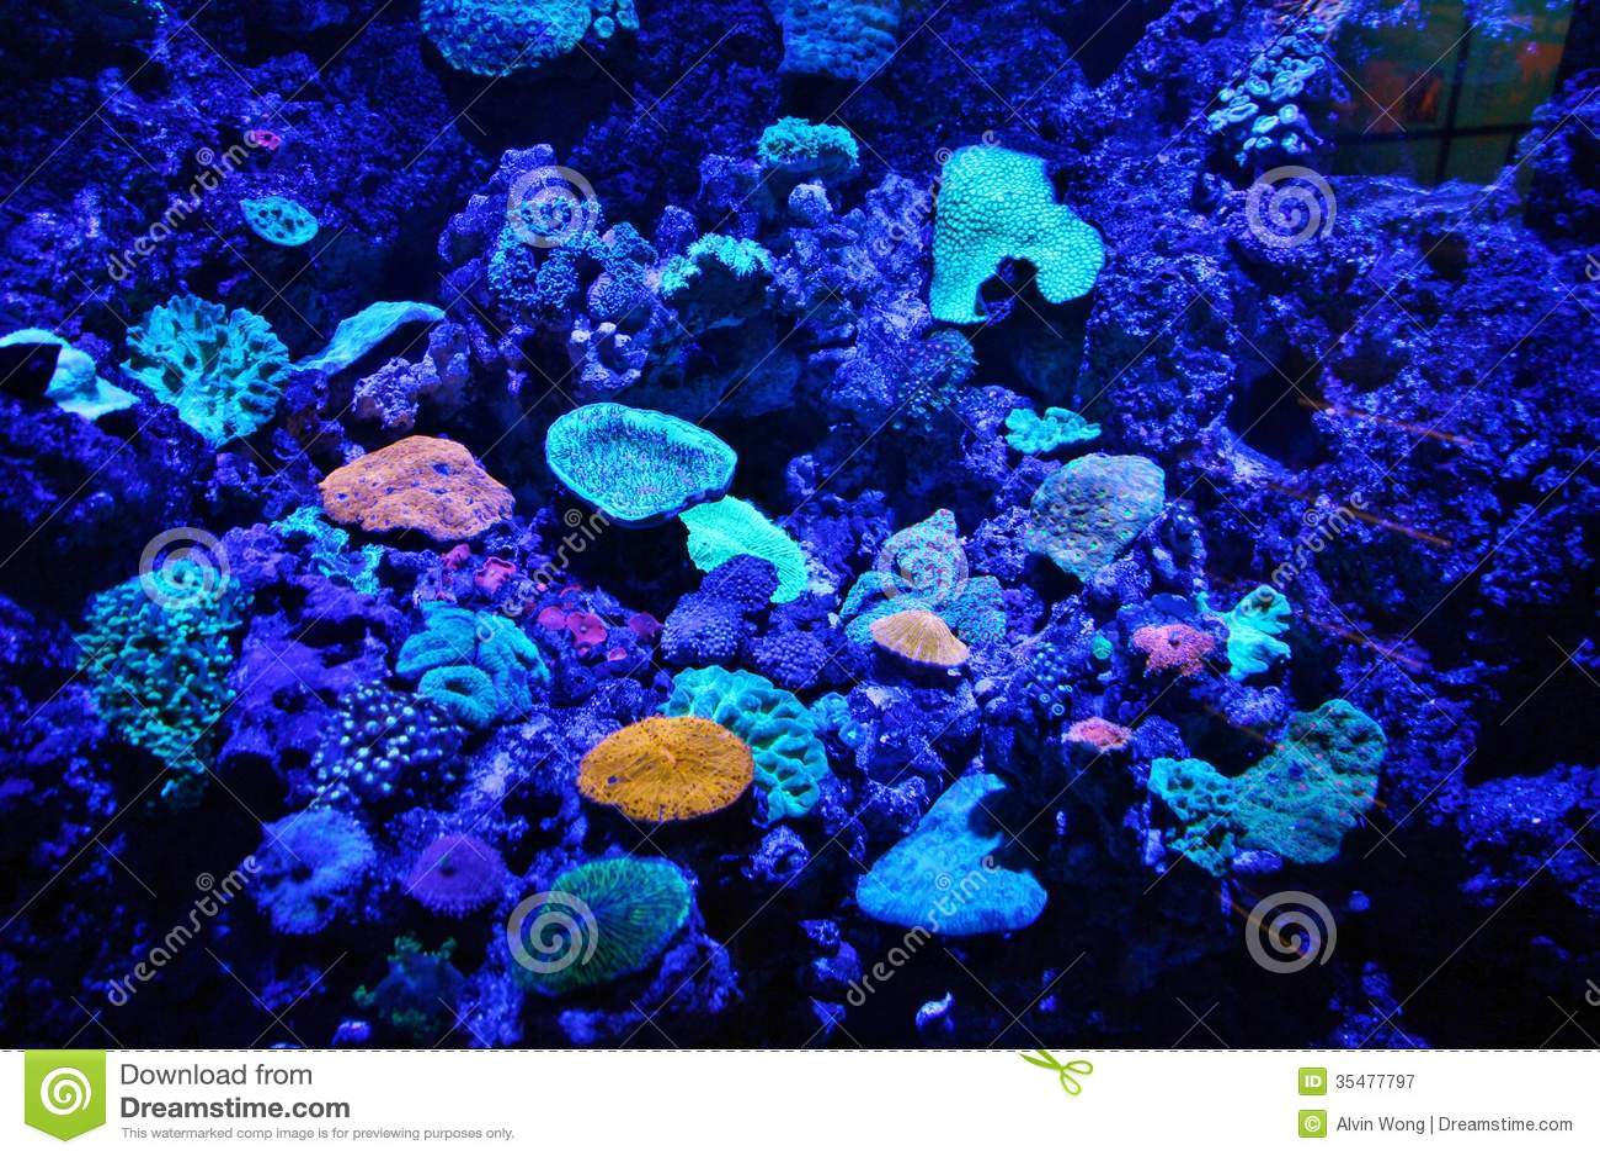 Blue aquarium royalty free stock photography image 35477797 for Blue fish aquarium